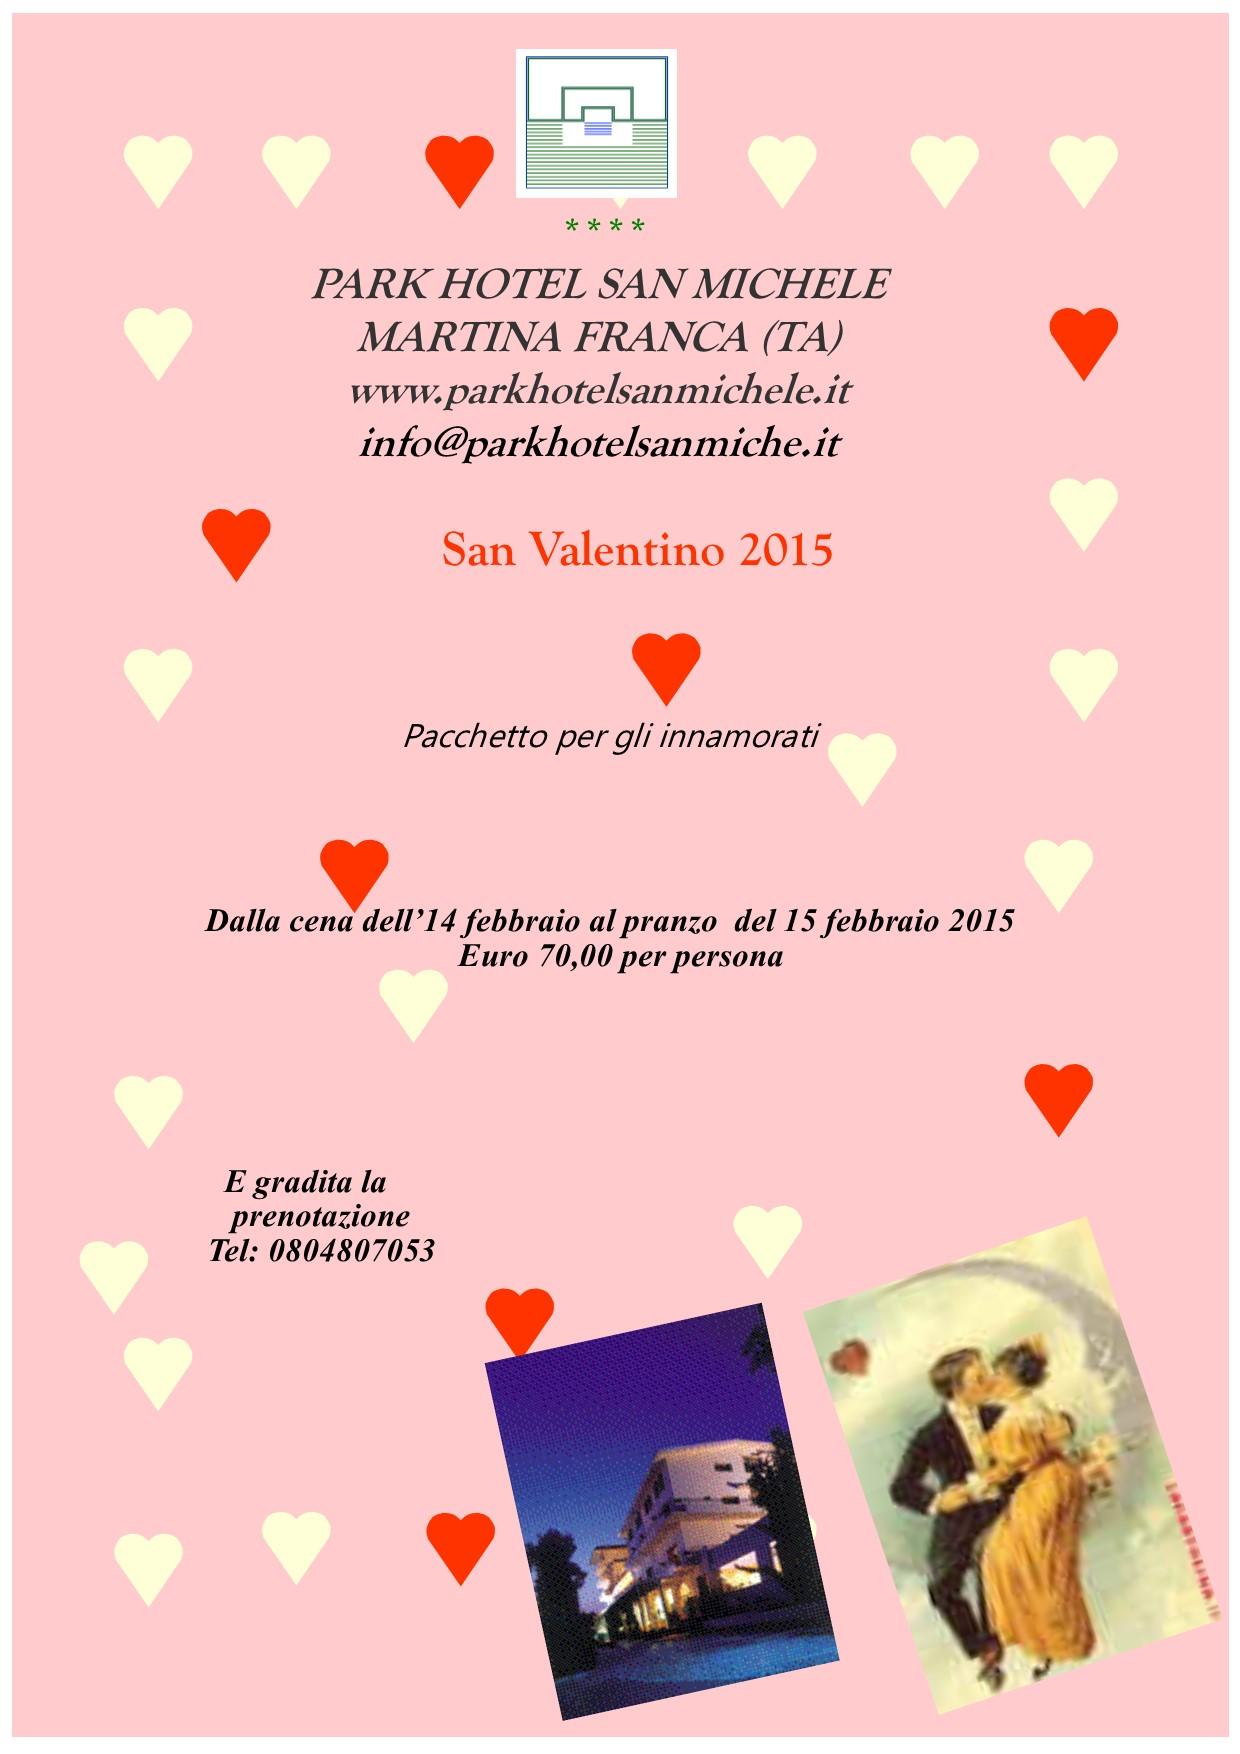 San Valentino, 2015, week end, Martina Franca, Park Hotel San Michele